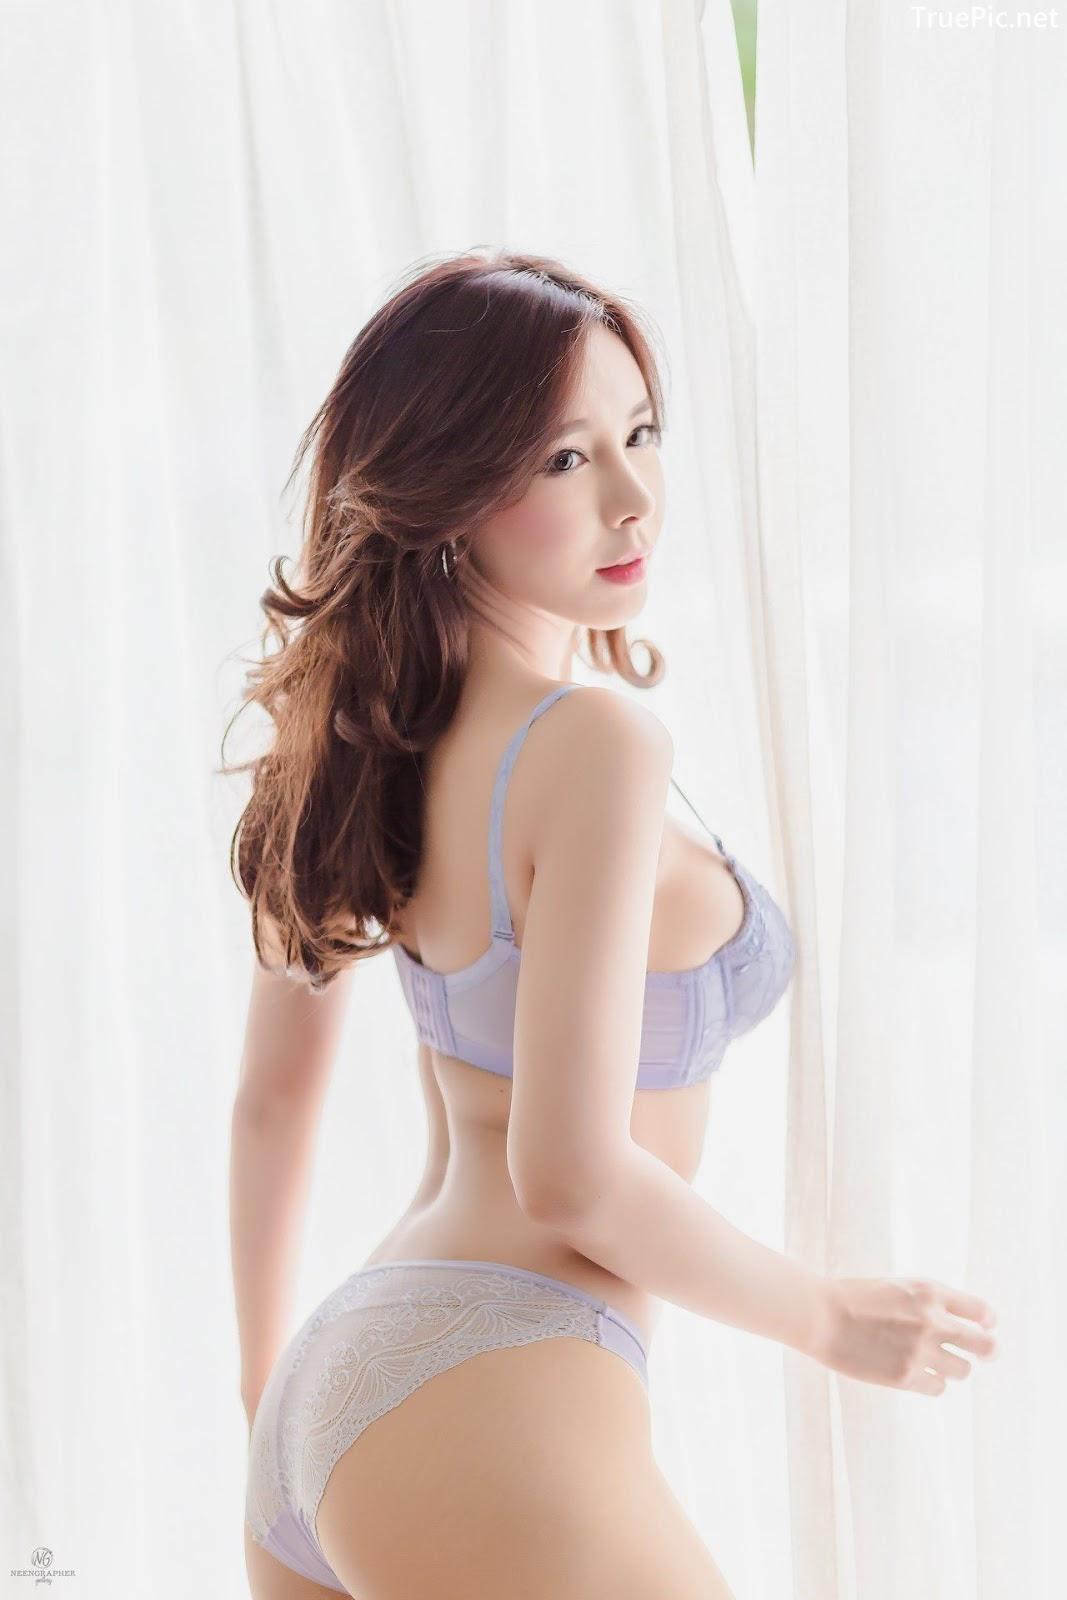 Image-Thailand-Hot-Model-Skykikijung-Purple-Lingerie-TruePic.net- Picture-5